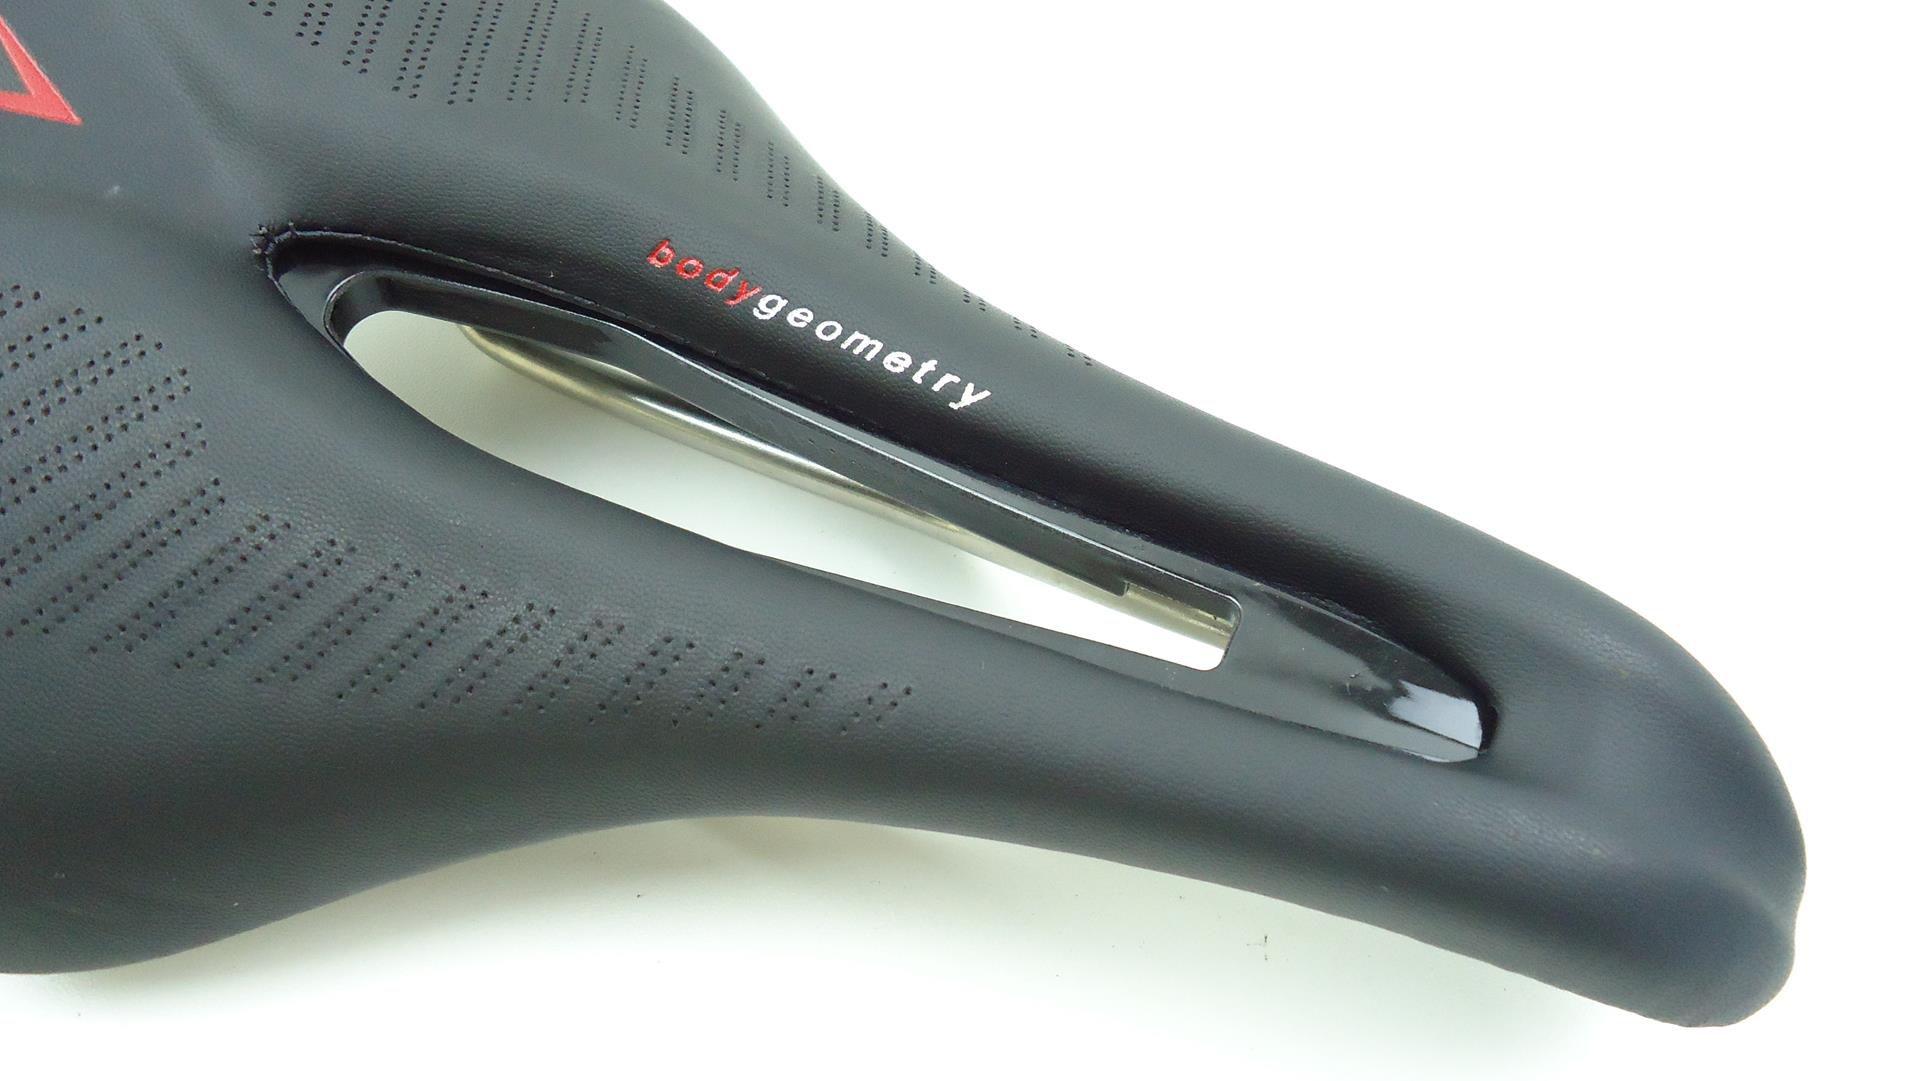 Selim Bicicleta Argon Power Cor Preto para Speed ou Mtb 160mm